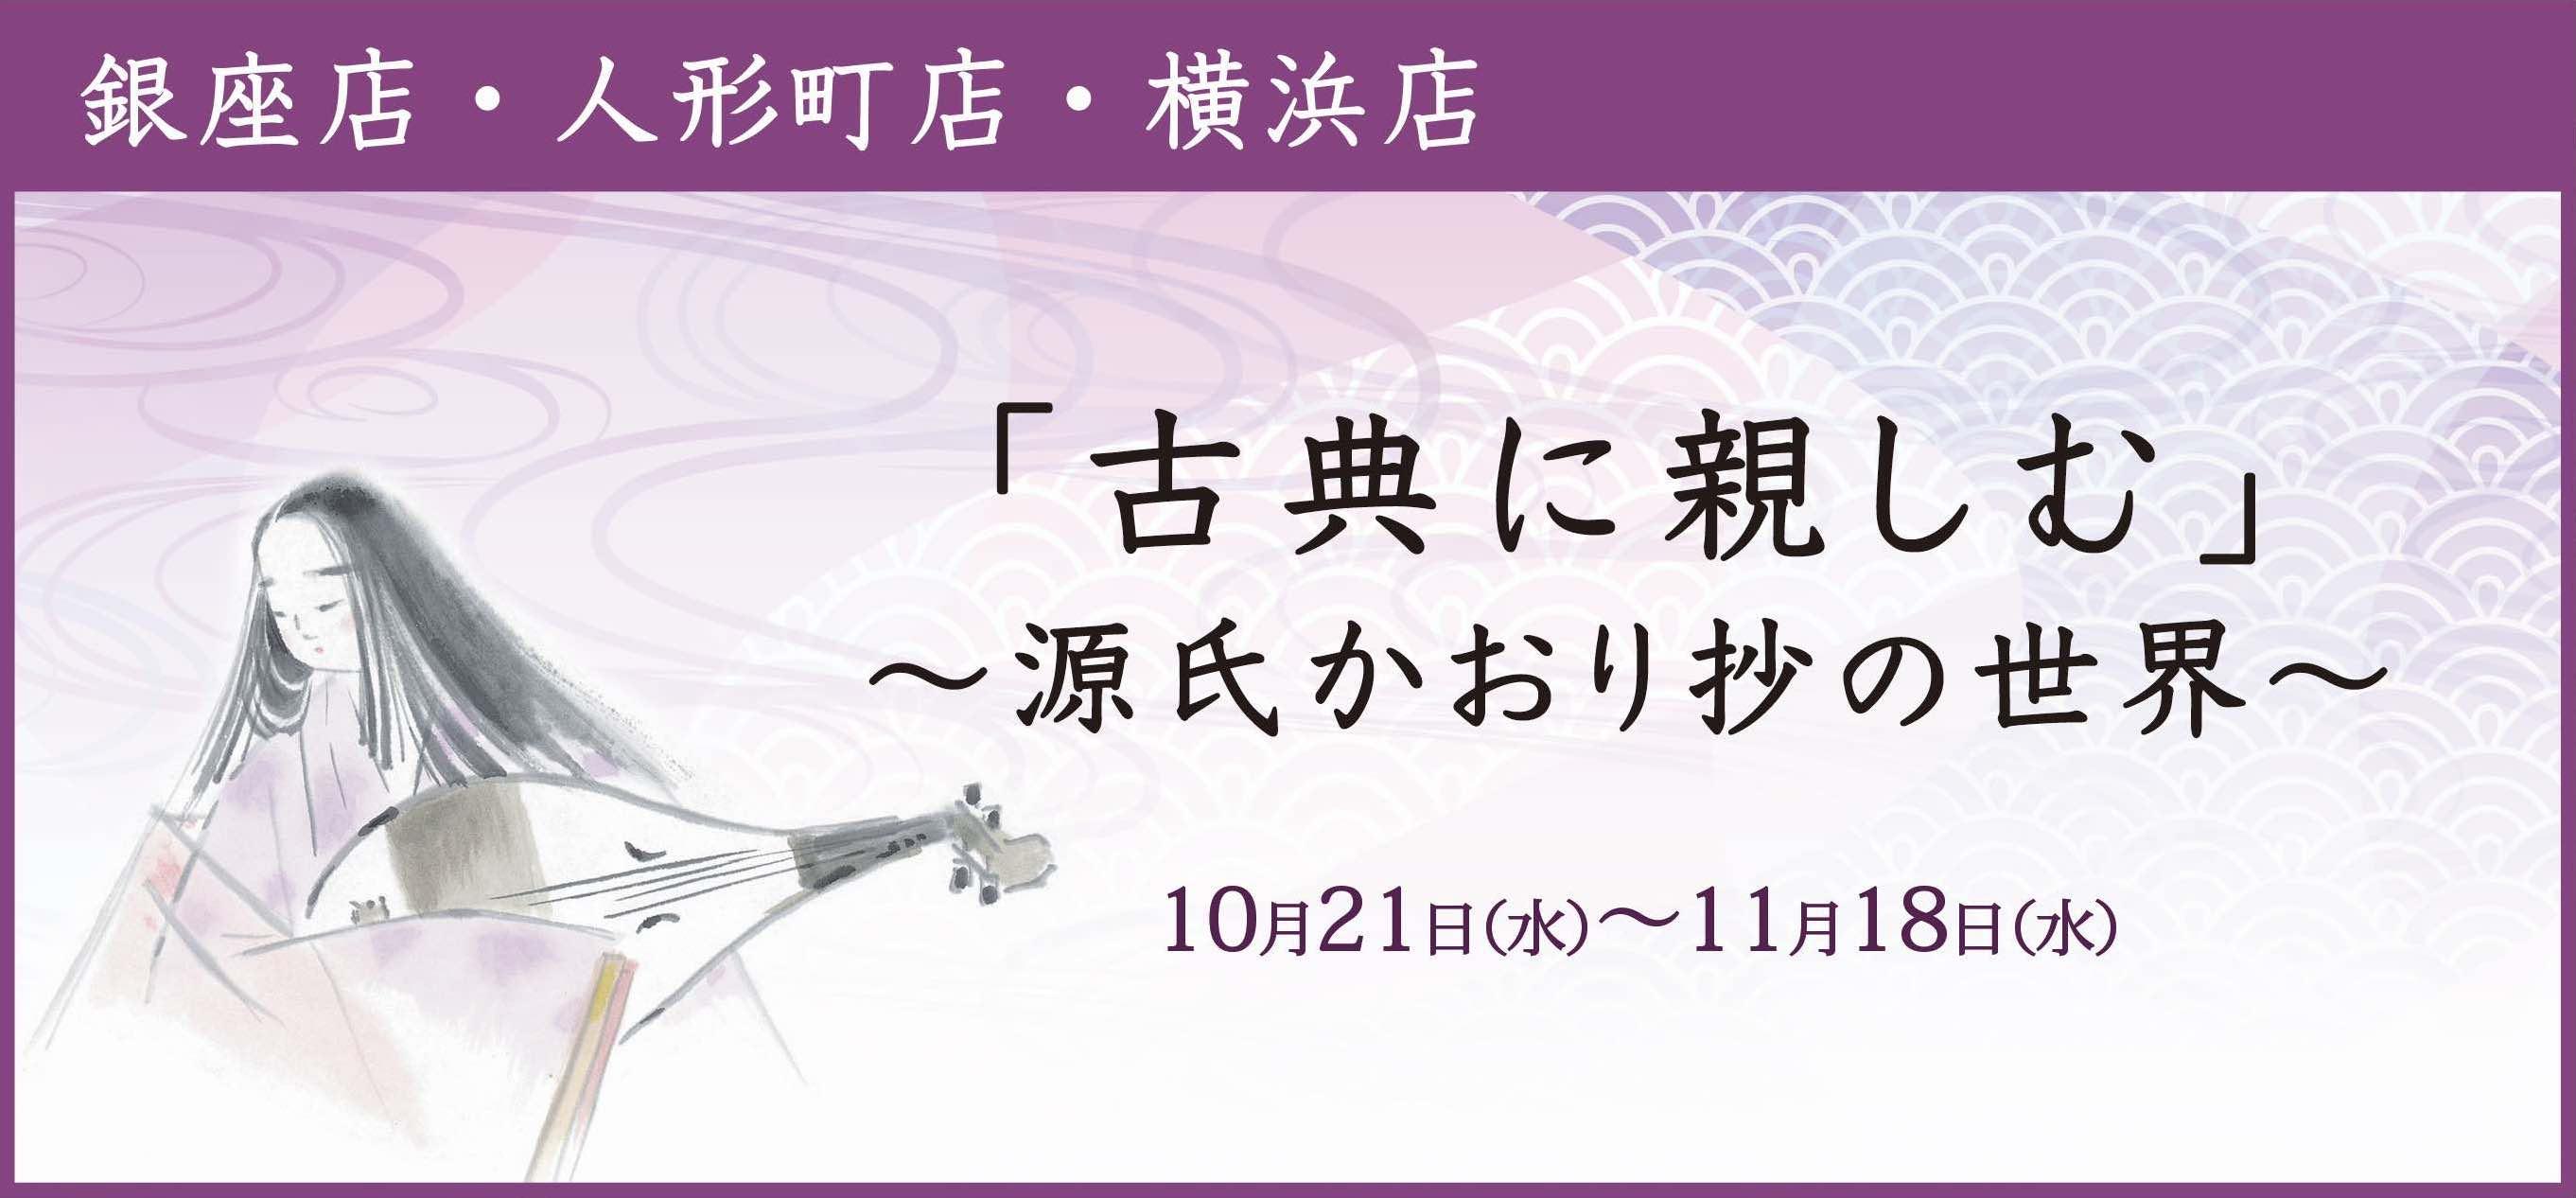 201910ginza_koten_banner.jpg